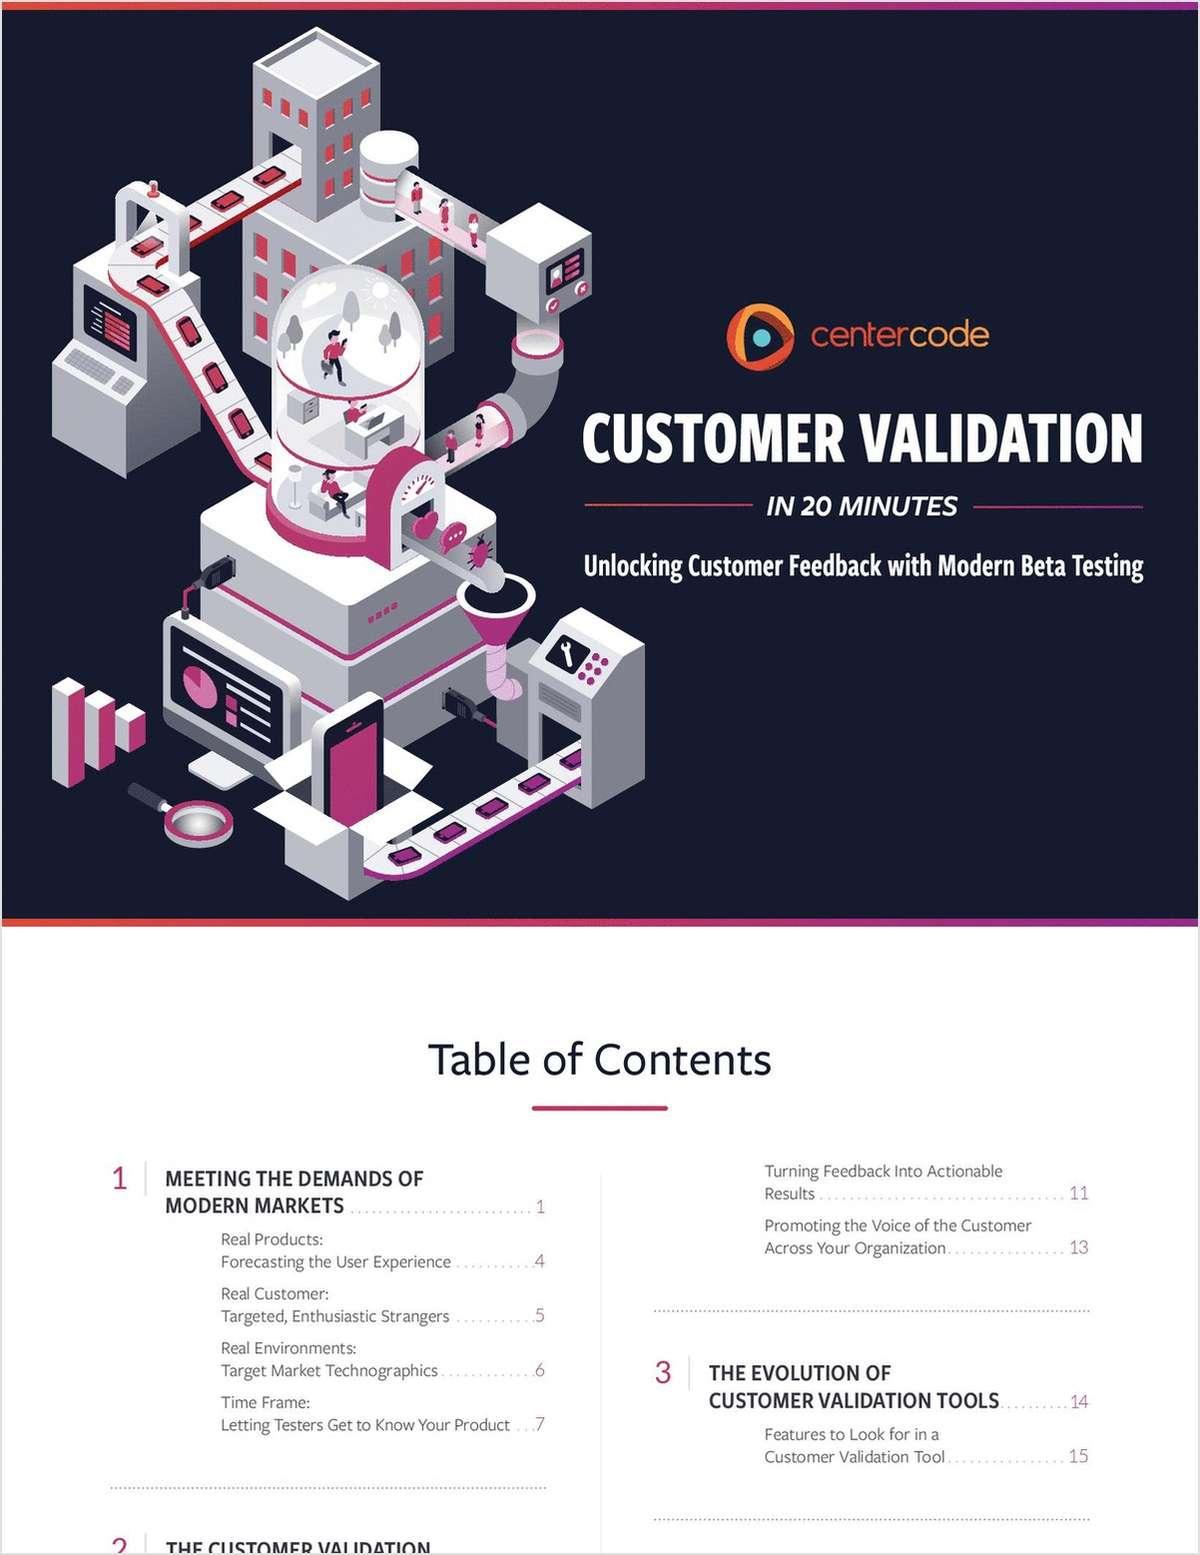 Customer Validation in 20 Minutes